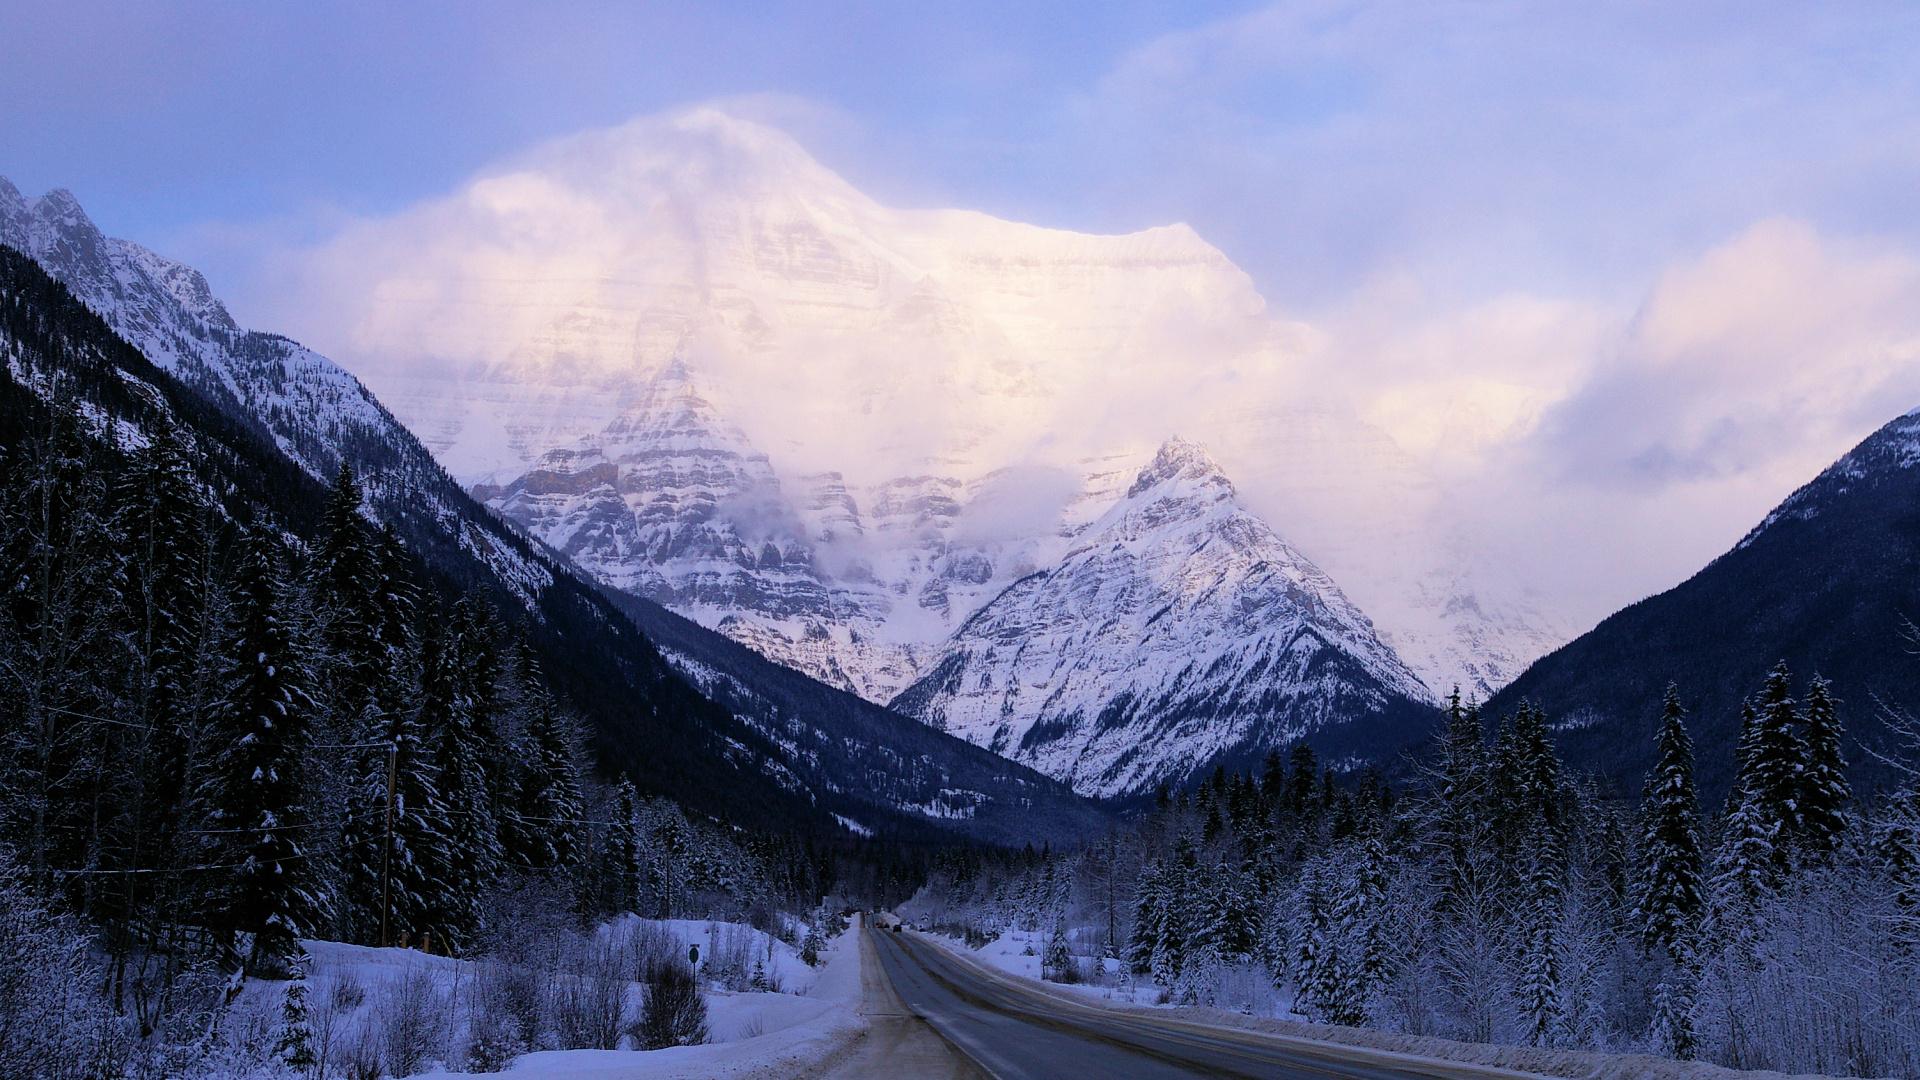 Mount Robson BC Canada December